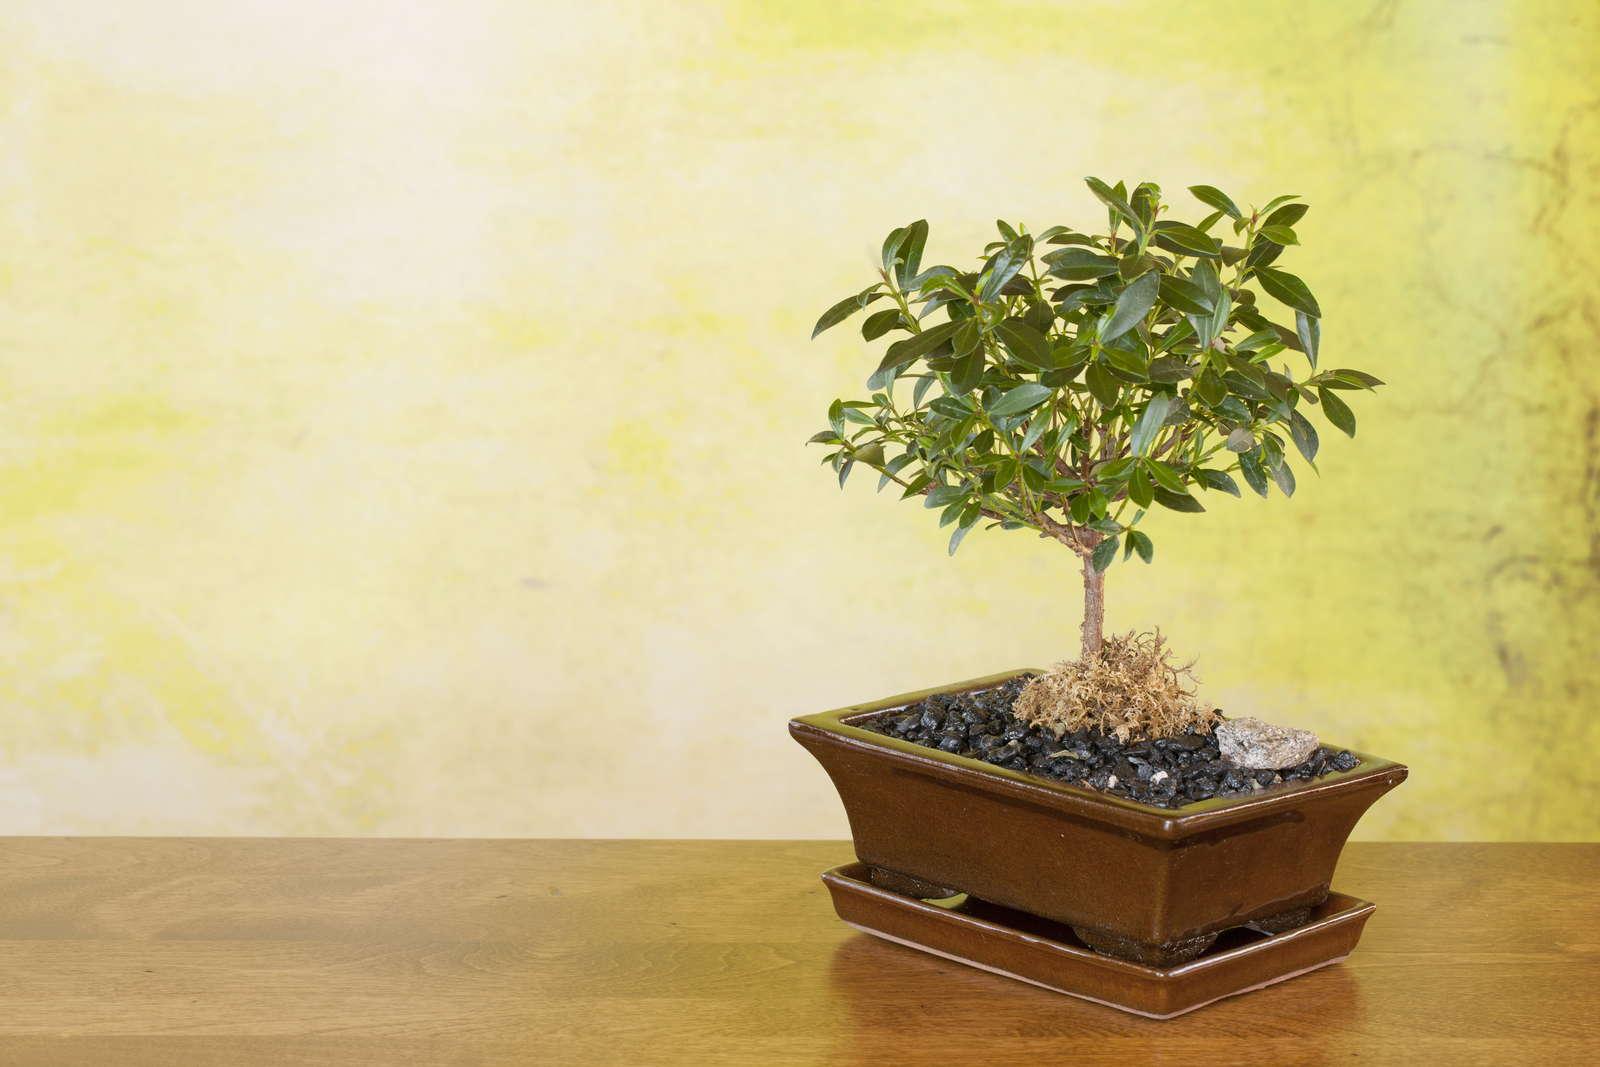 Бонсай (МИНИ ДЕРЕВО посадка и уход, выращивание, размножение) 65